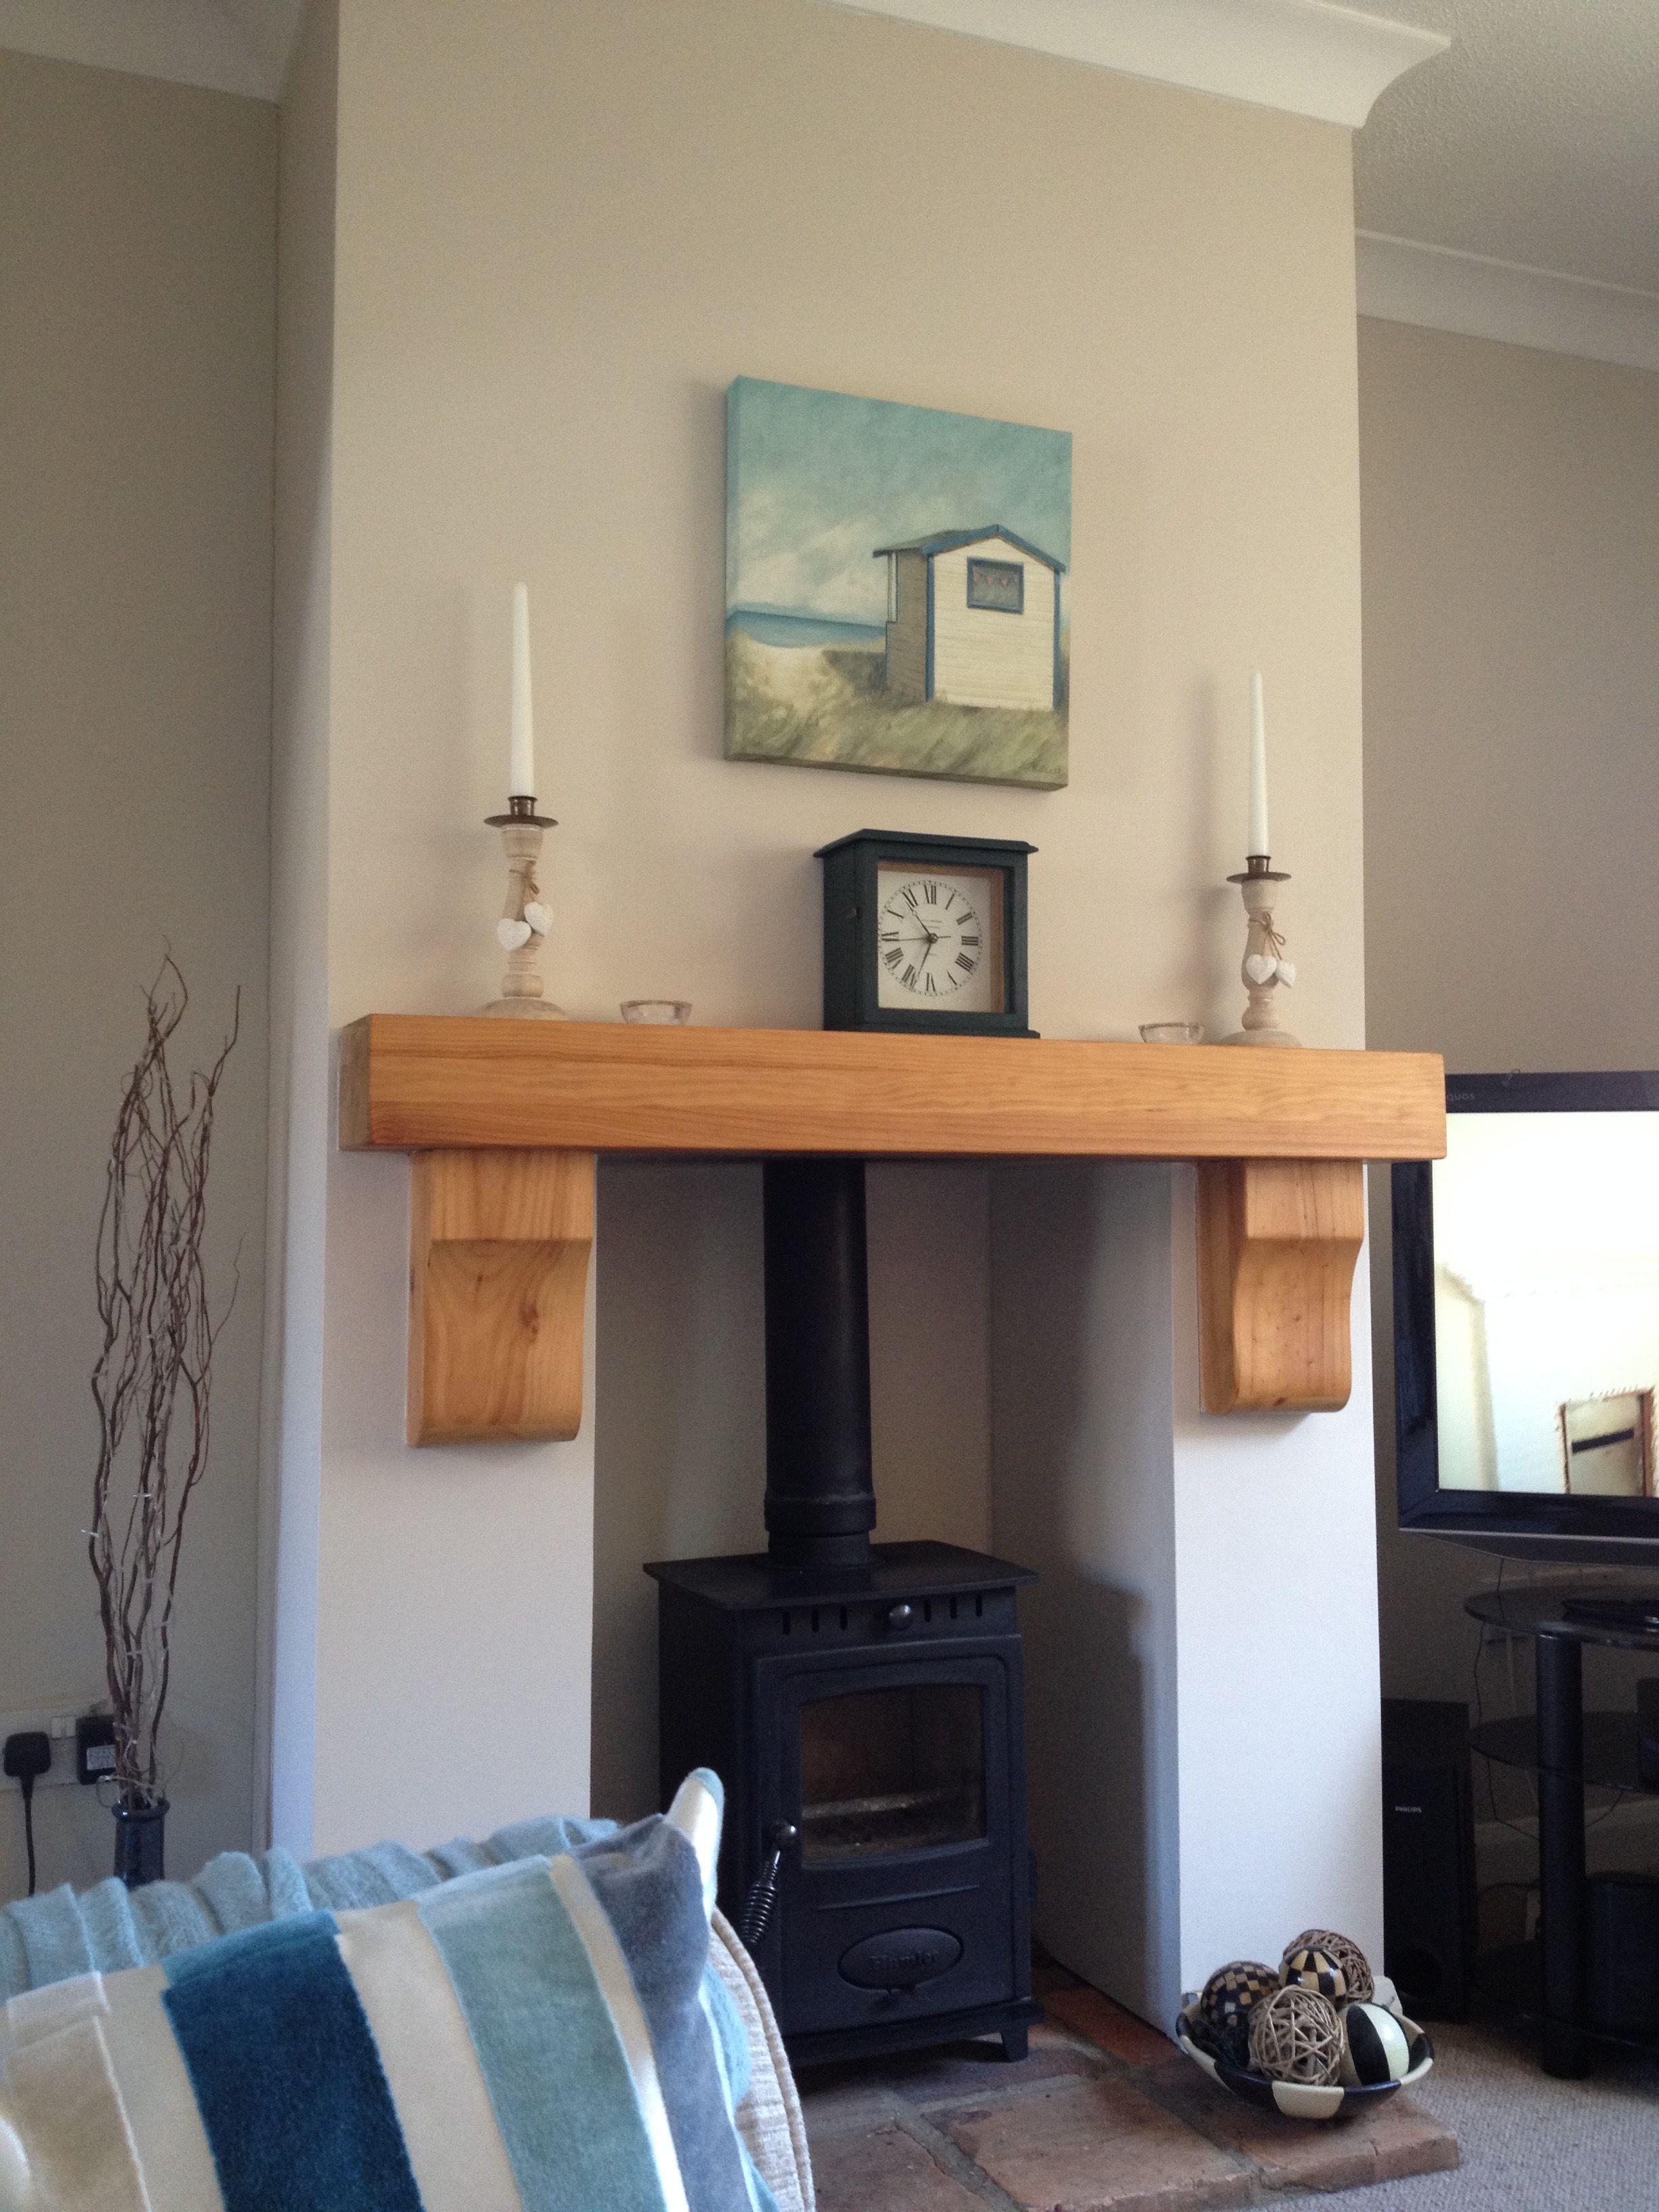 Woodburner installed on a flat internal wall that had no chimney ...